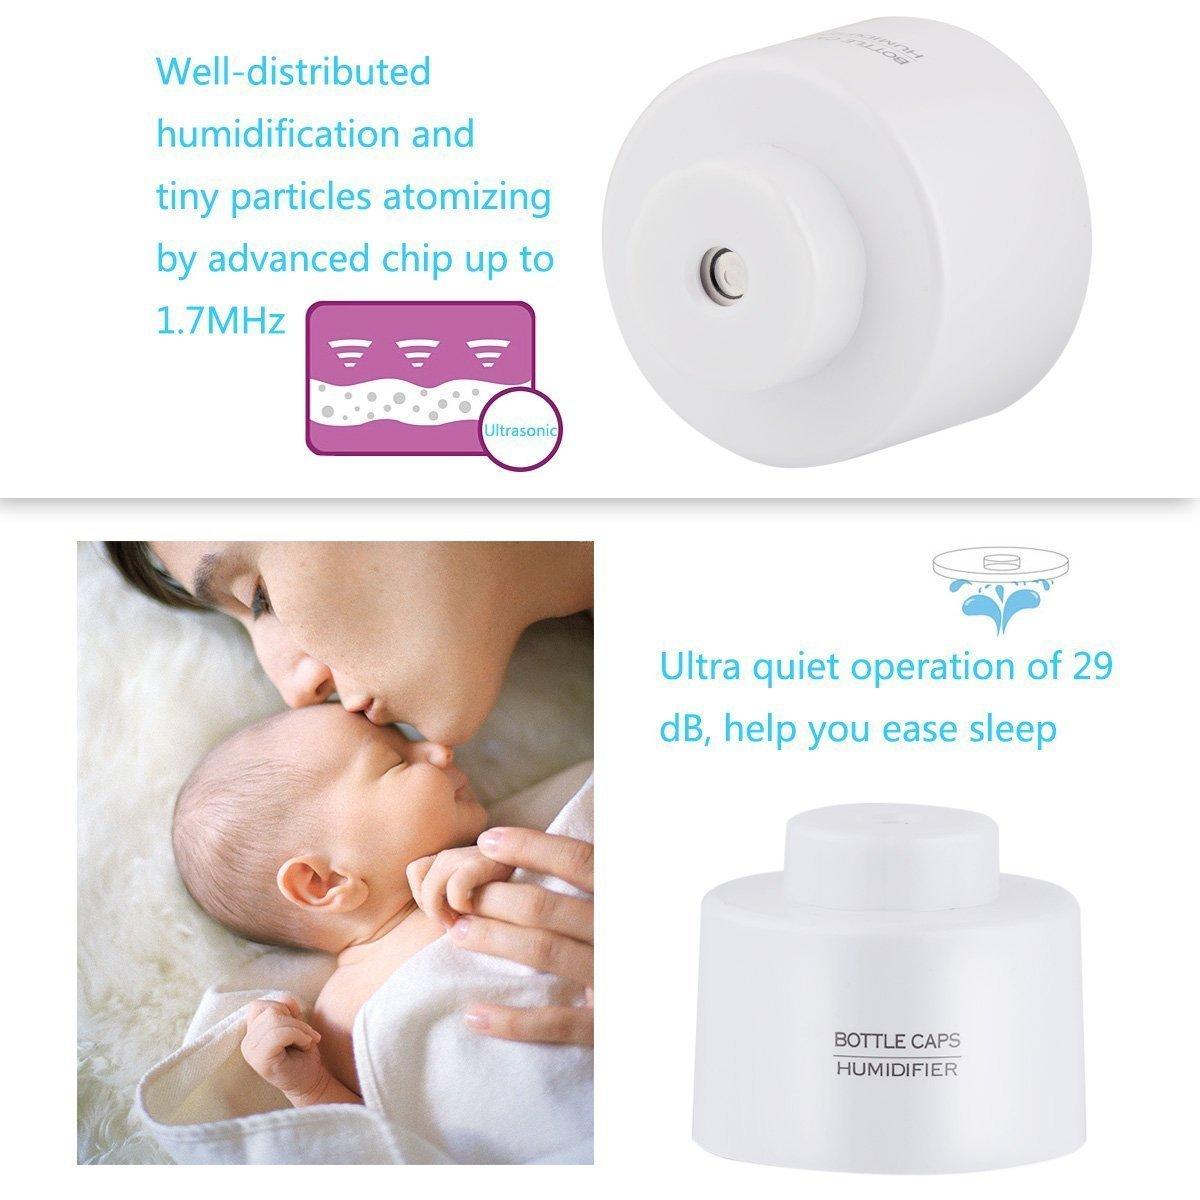 CTKcom Mini Portable Bottle Cap Design USB Ultrasonic Humidifier Air Diffuser for Office Travel Home Room Bedroom Desk Car Vehicle,White